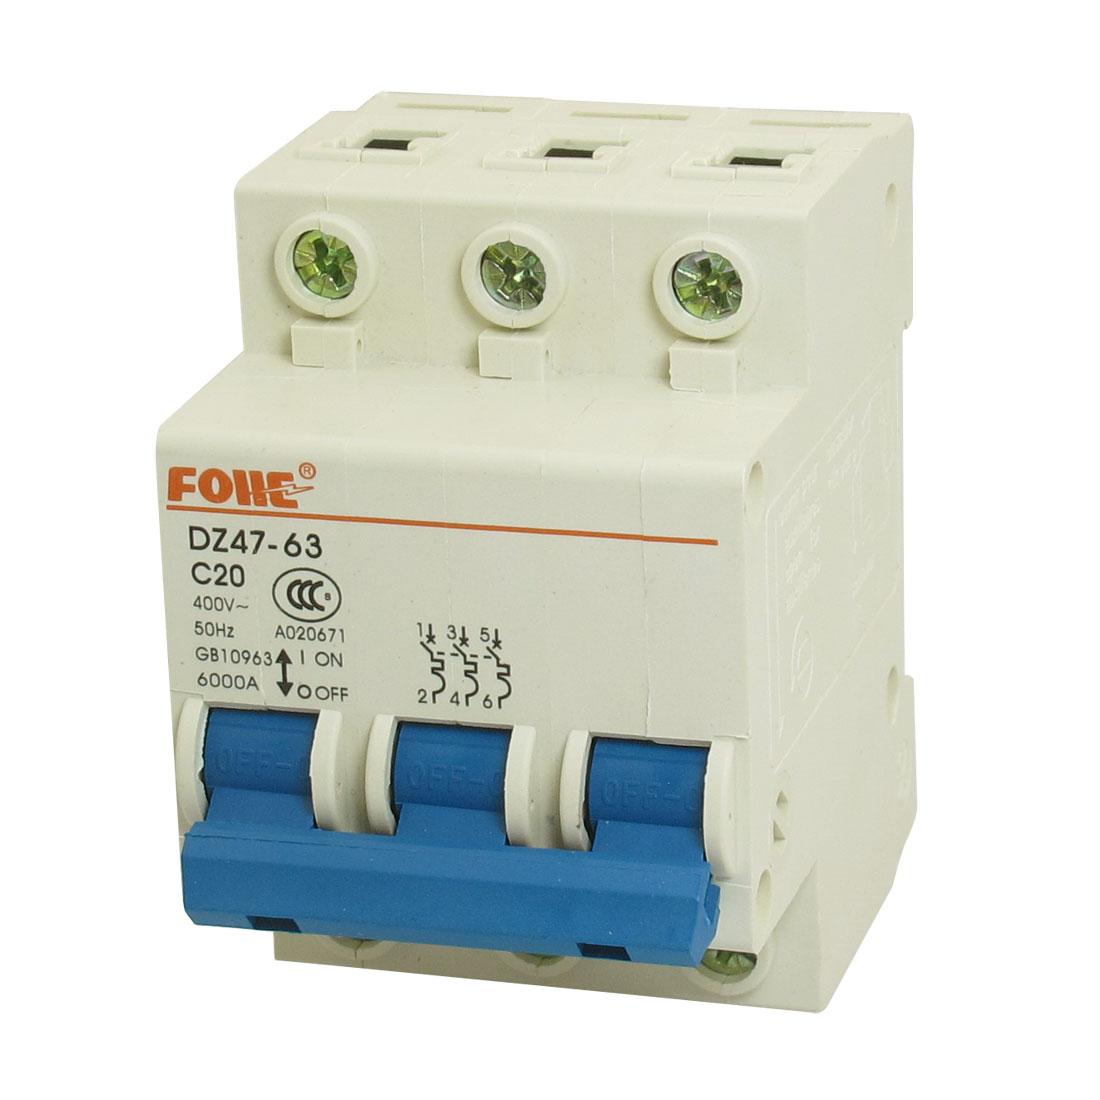 DZ47-63 C20 3P DIN Rail Mounted MCB Miniature Circuit Breaker 6000A 20A 400V AC